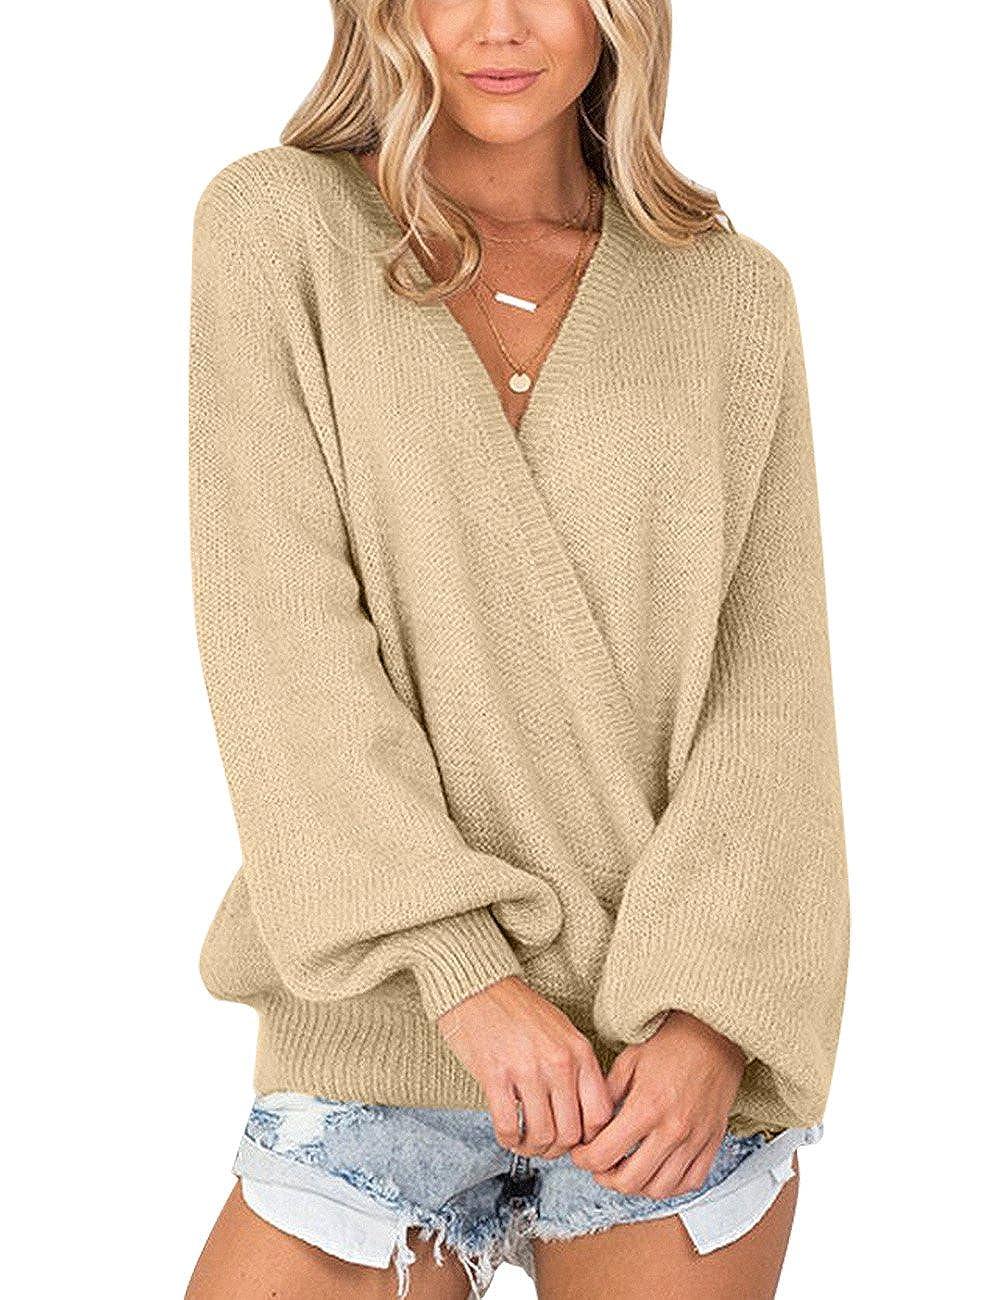 Lookbook Store Women s Knit Long Sleeve Faux Wrap Surplice V Neck Sweater  Top at Amazon Women s Clothing store  b3bdfda1f